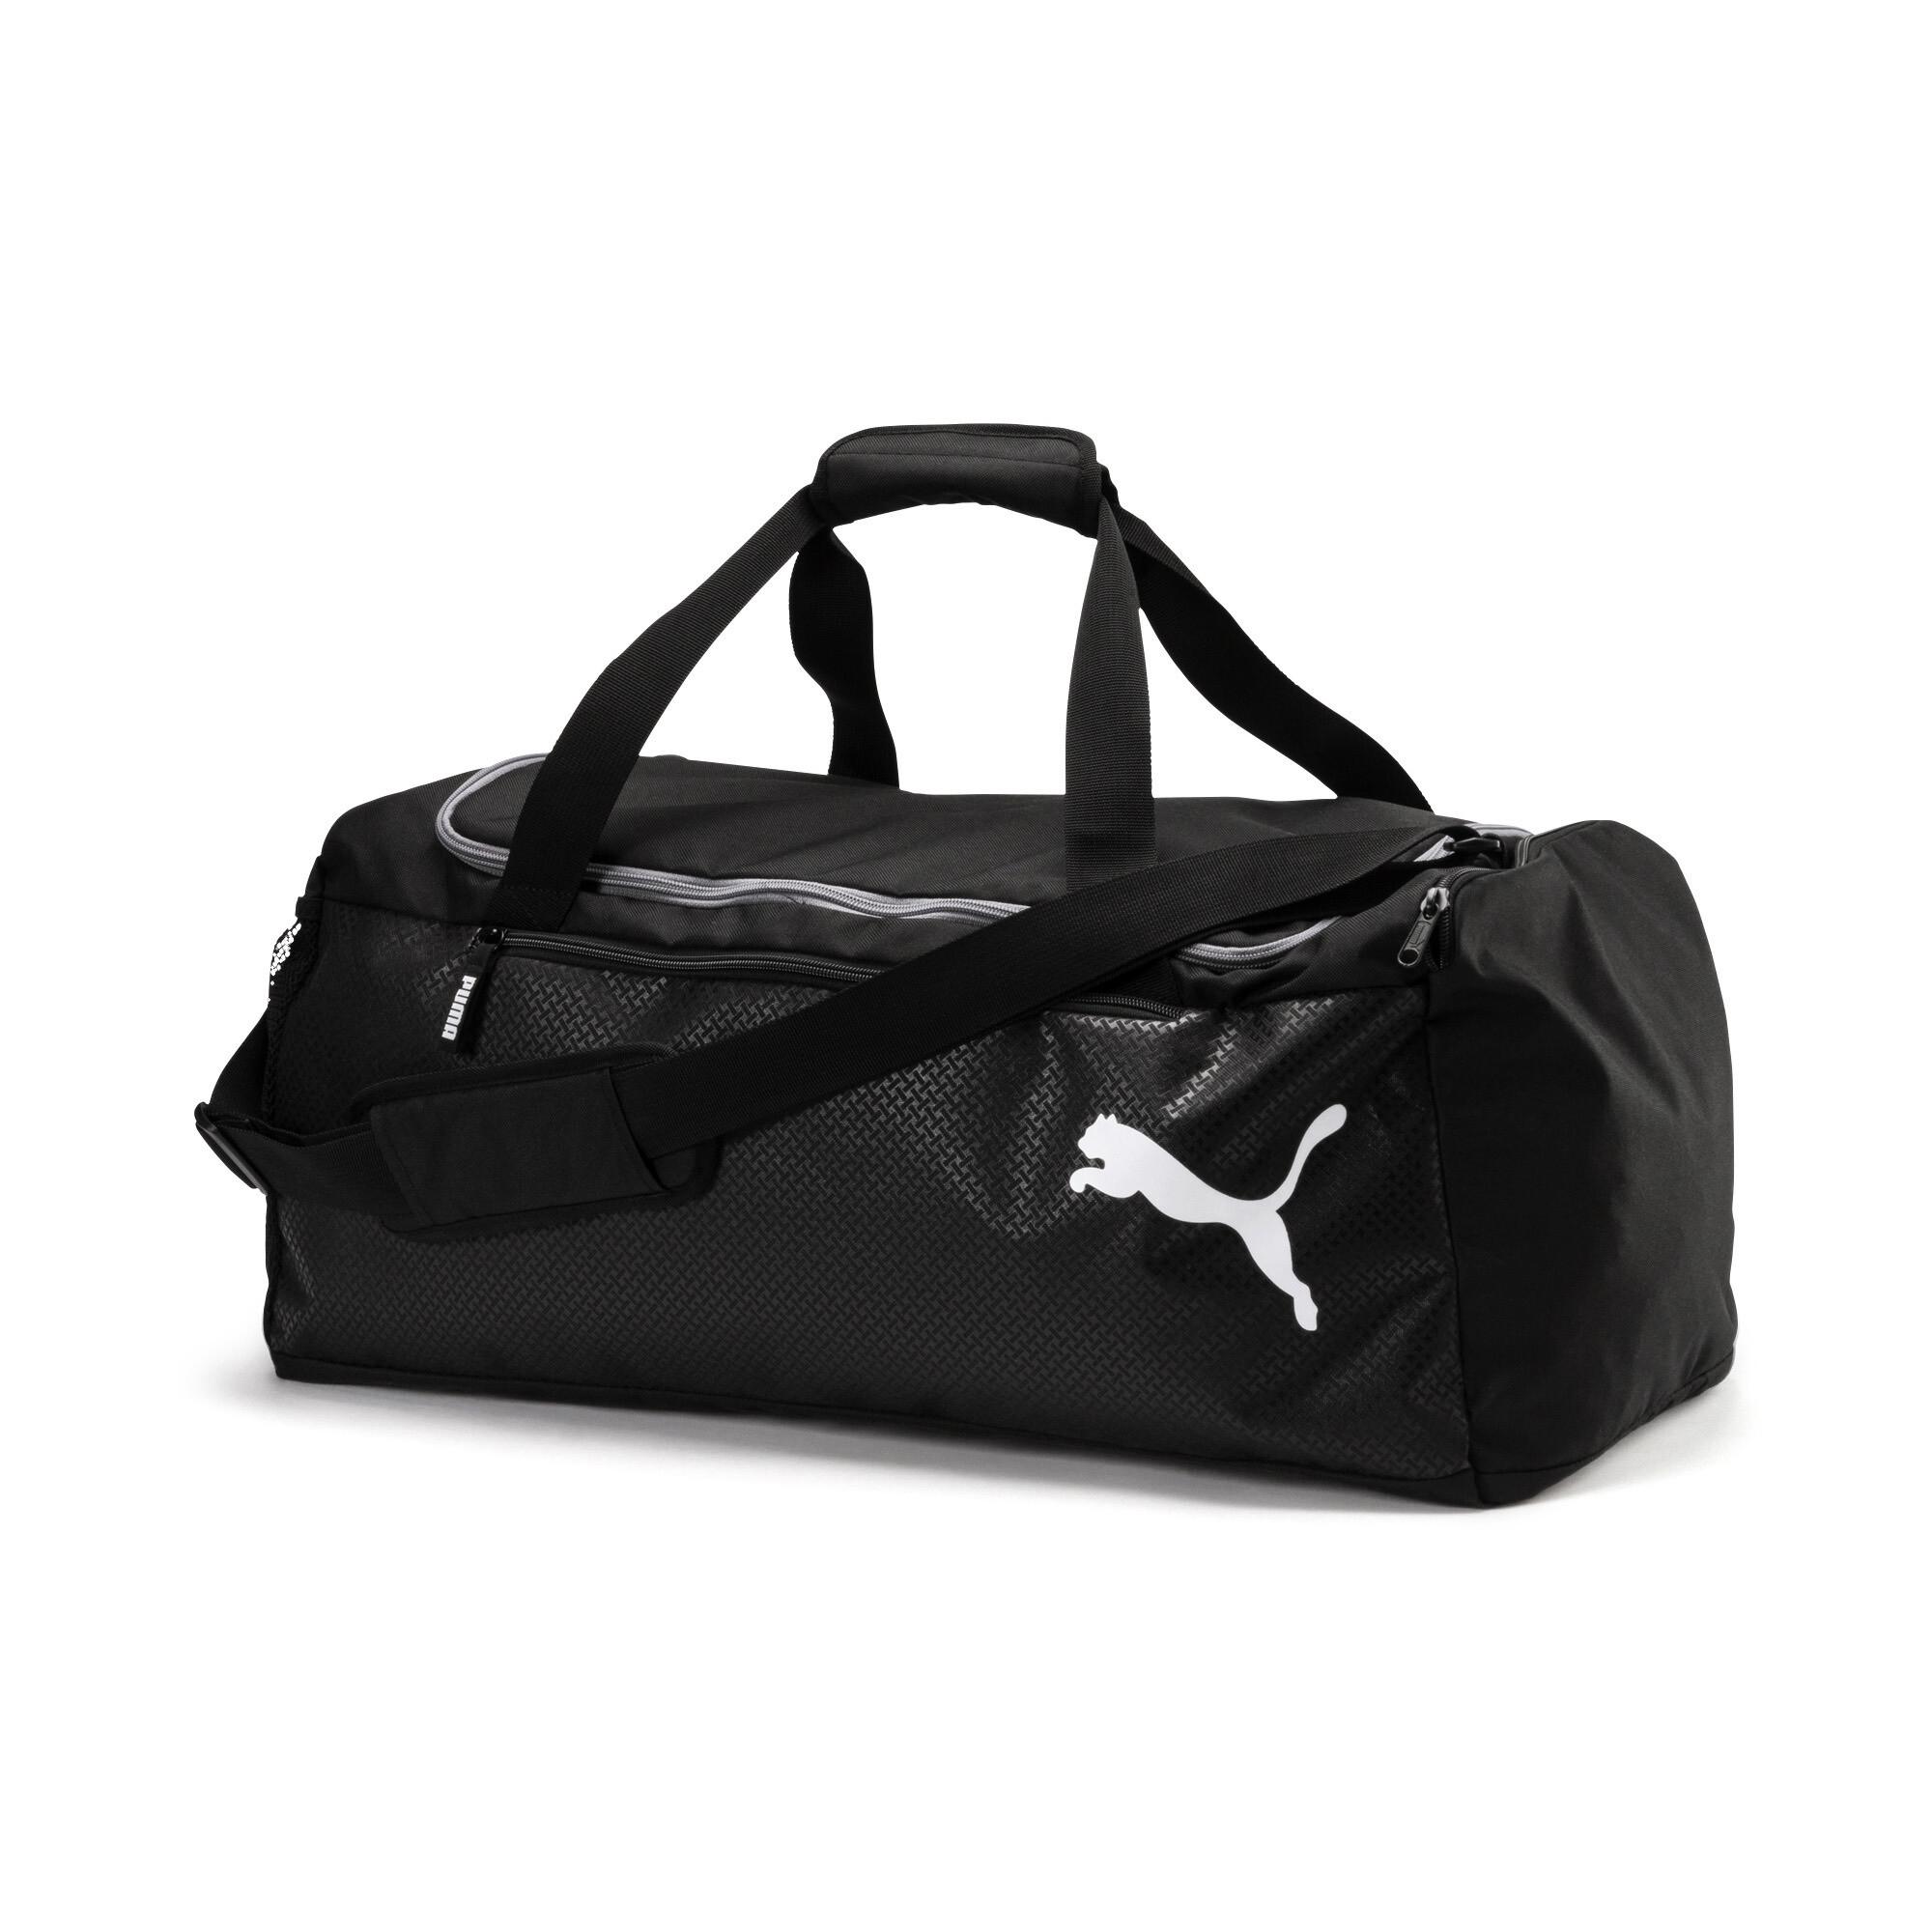 b31a628aff7 Image Puma Fundamentals Medium Sports Bag #1. Zoom In